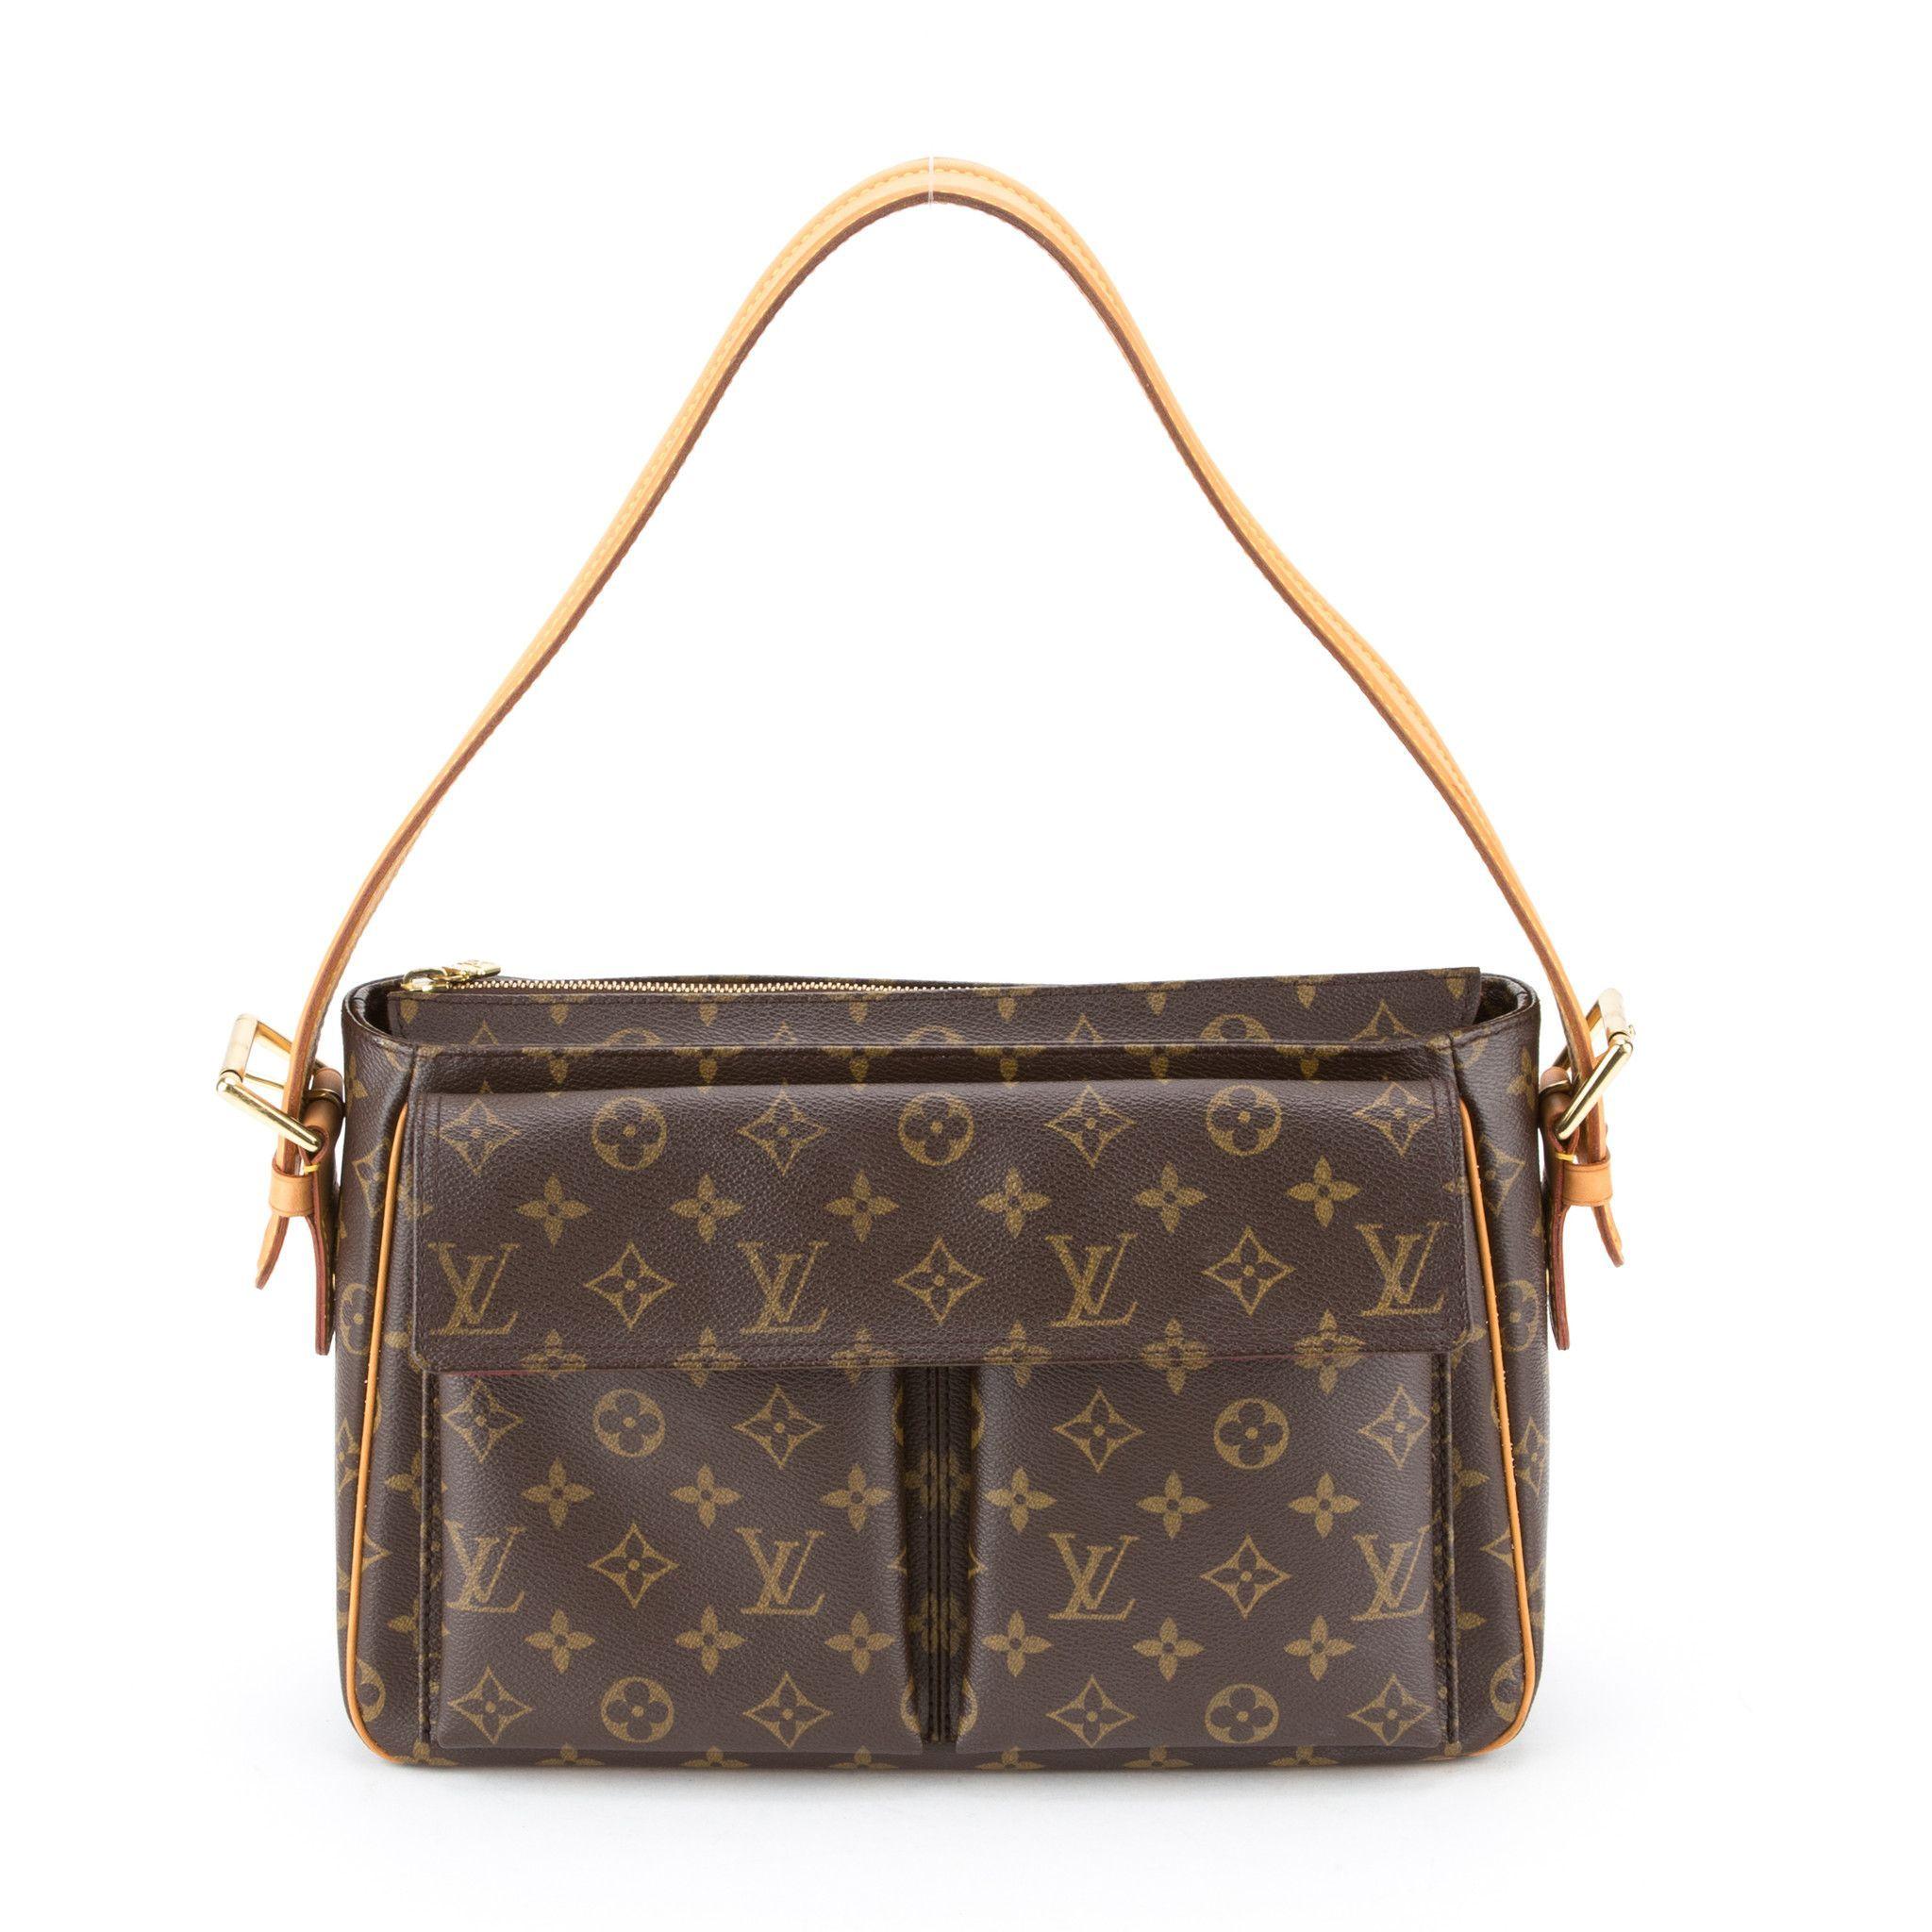 Louis Vuitton Viva-Cite GM (Authentic Pre Owned)